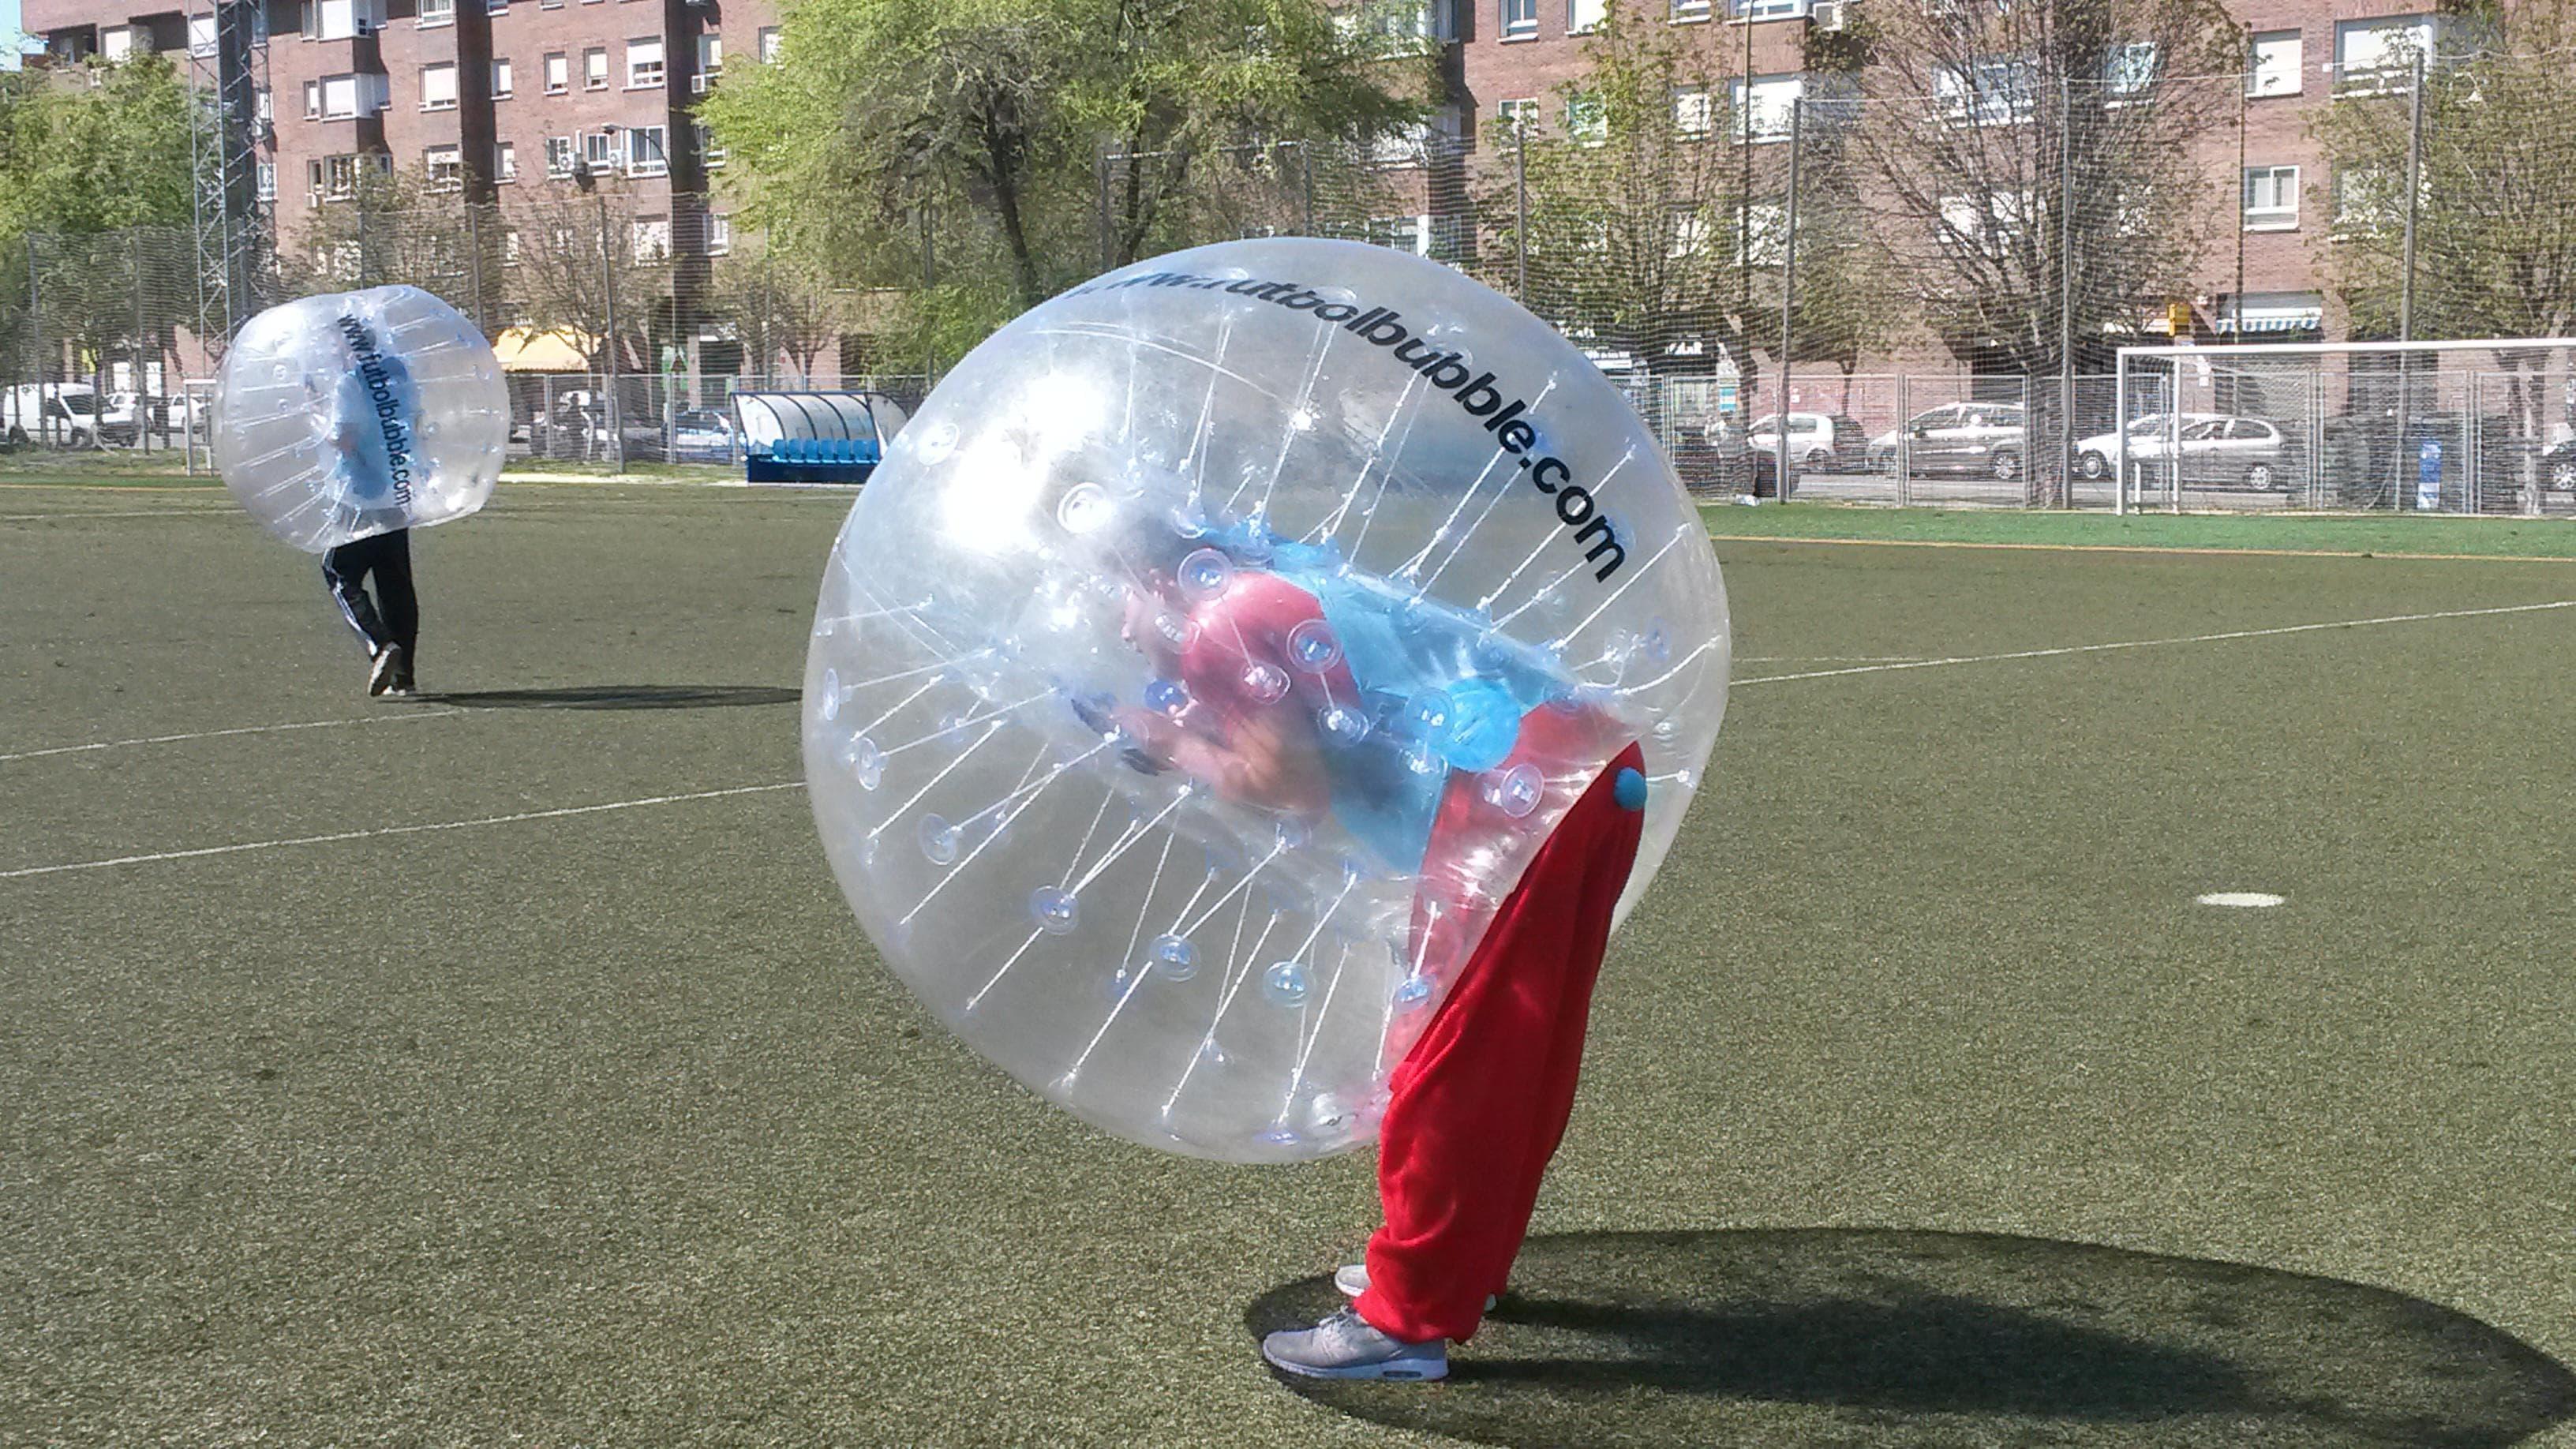 Futbol Burbuja para despedidas